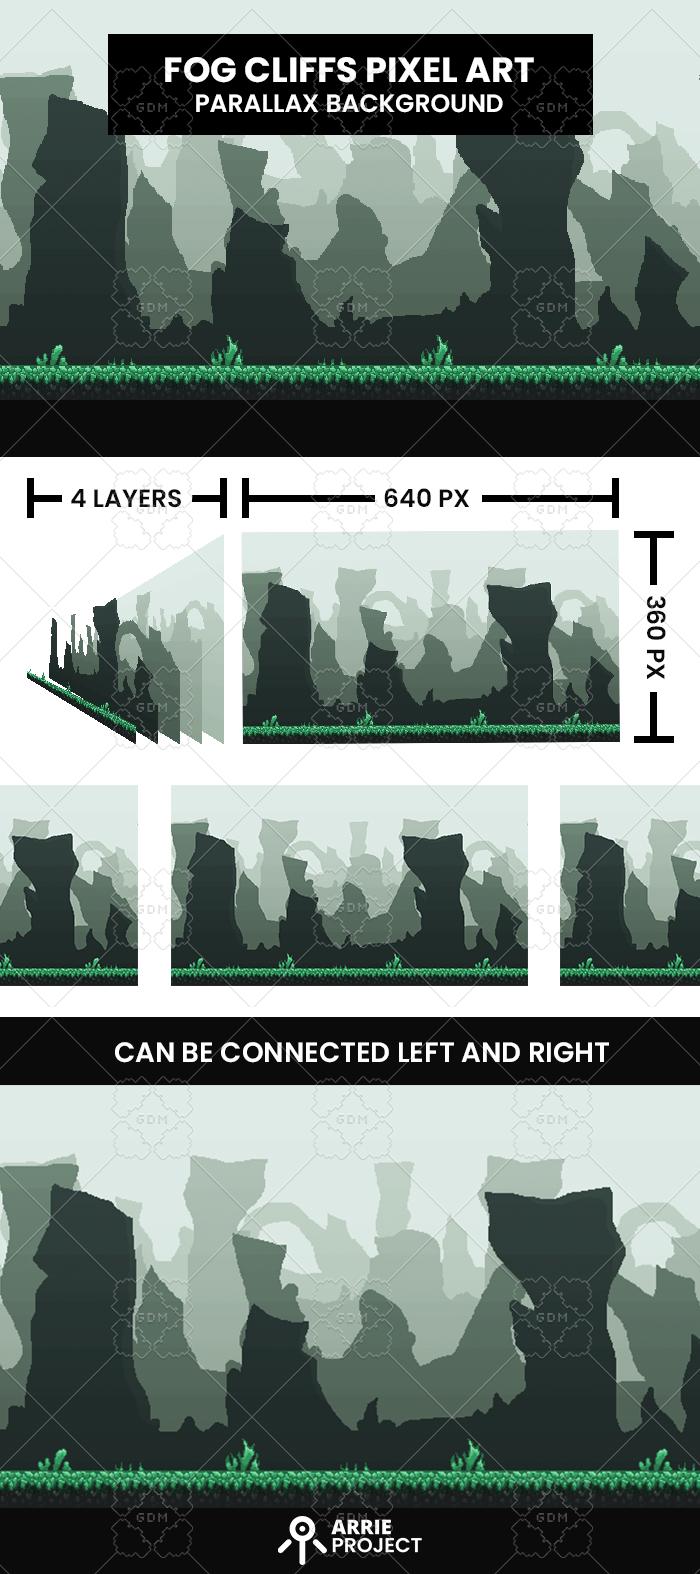 Fog Cliffs Pixelart Background